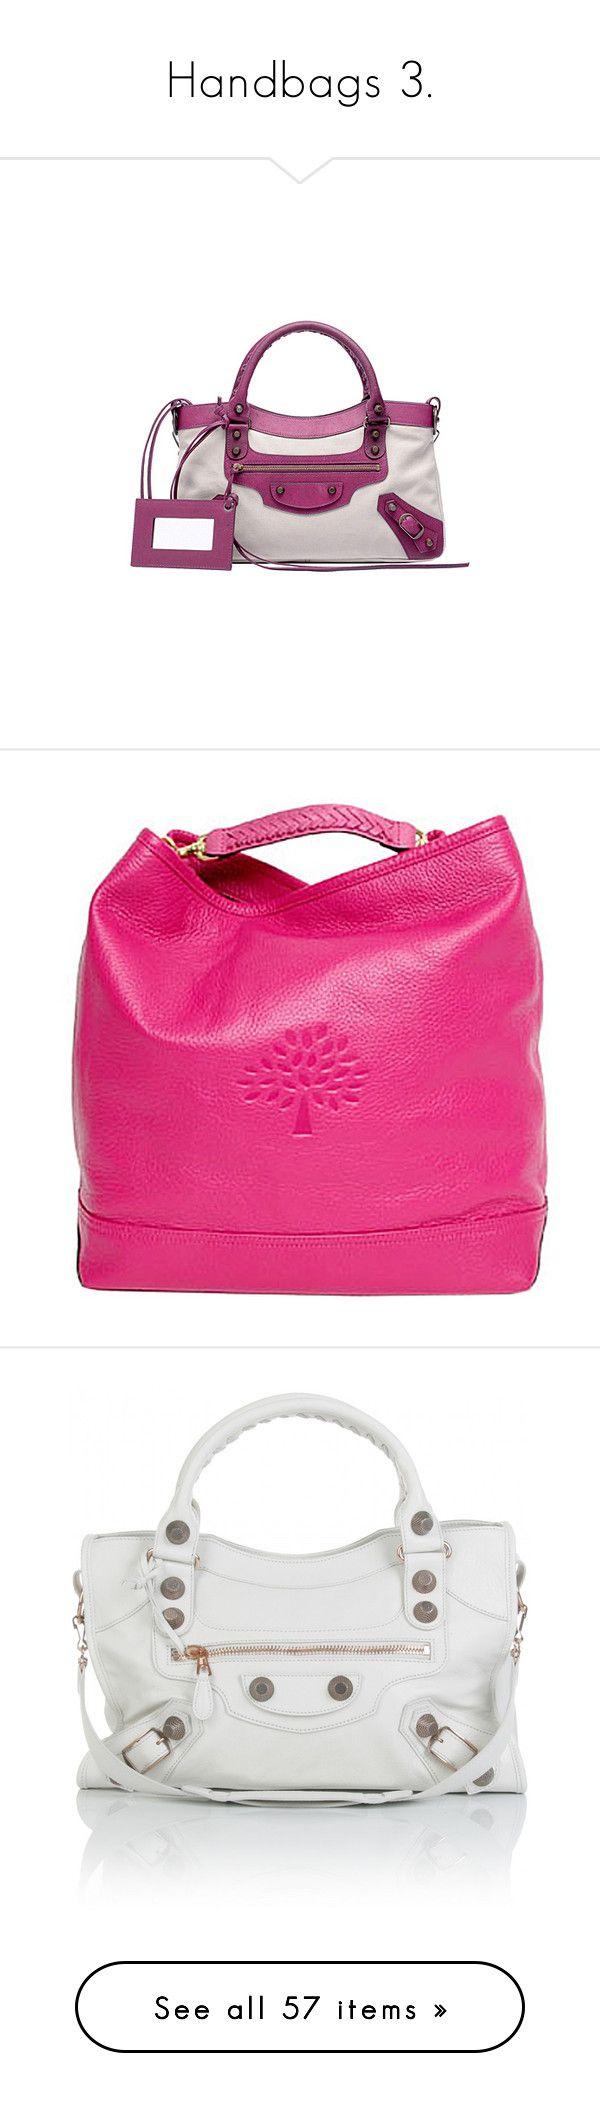 """Handbags 3."" by tjclay3 ❤ liked on Polyvore featuring bags, handbags, balenciaga, purses, purple handbags, balenciaga purse, purple bags, purple purse, hand bags and shoulder bags"